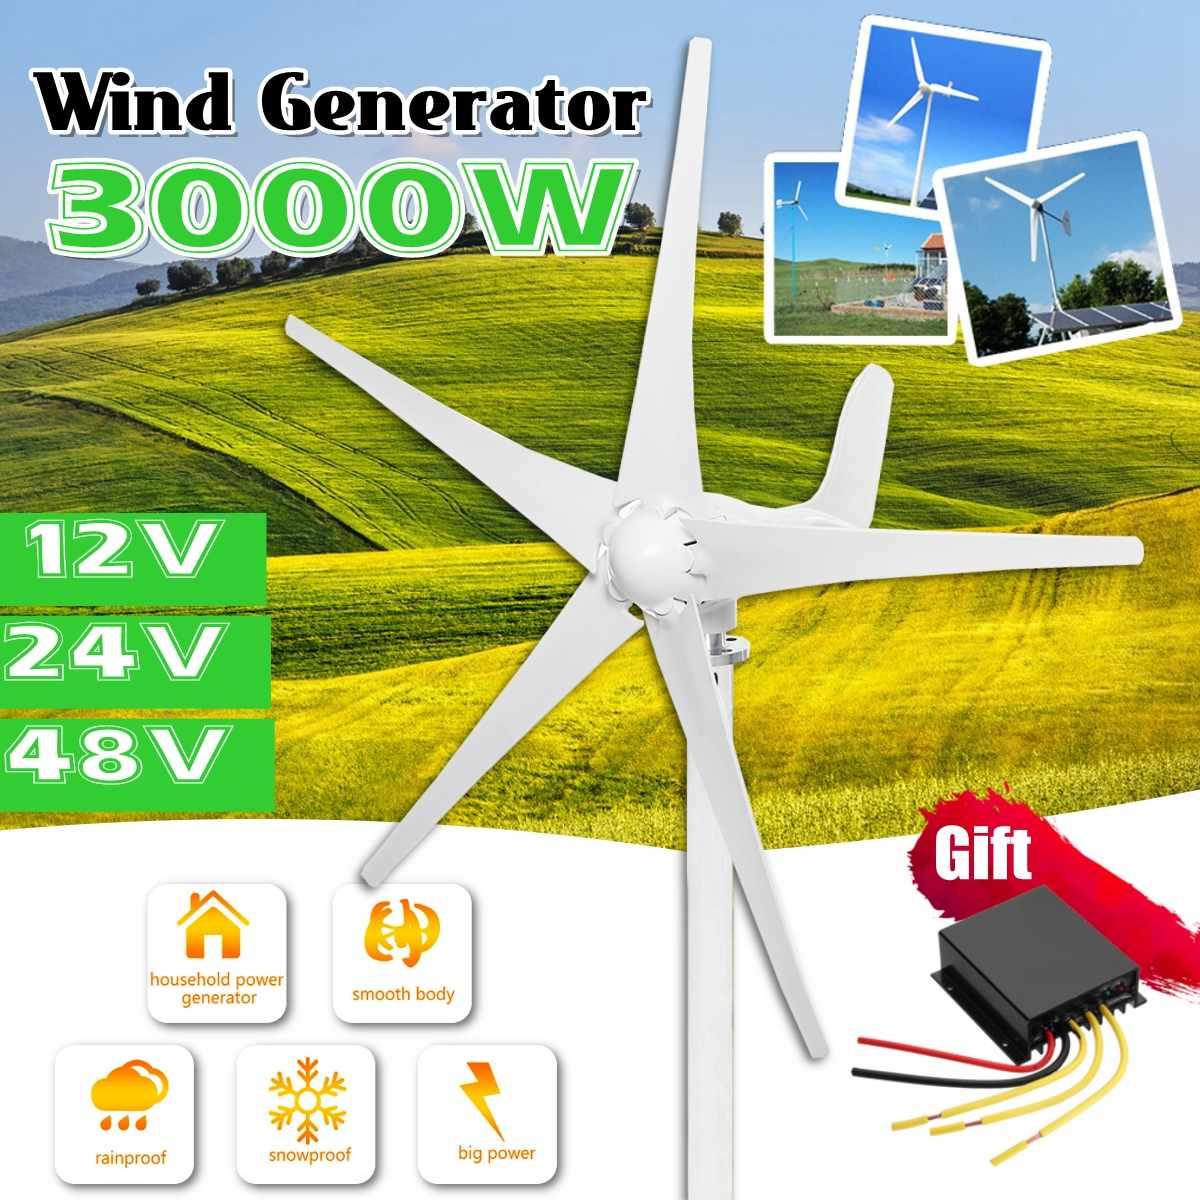 Generador de turbinas eólicas de 3000W, 12V/24V/48V, 5 cuchillas, con controlador de viento gratuito, uso para Alumbrado público Solar doméstico, barco